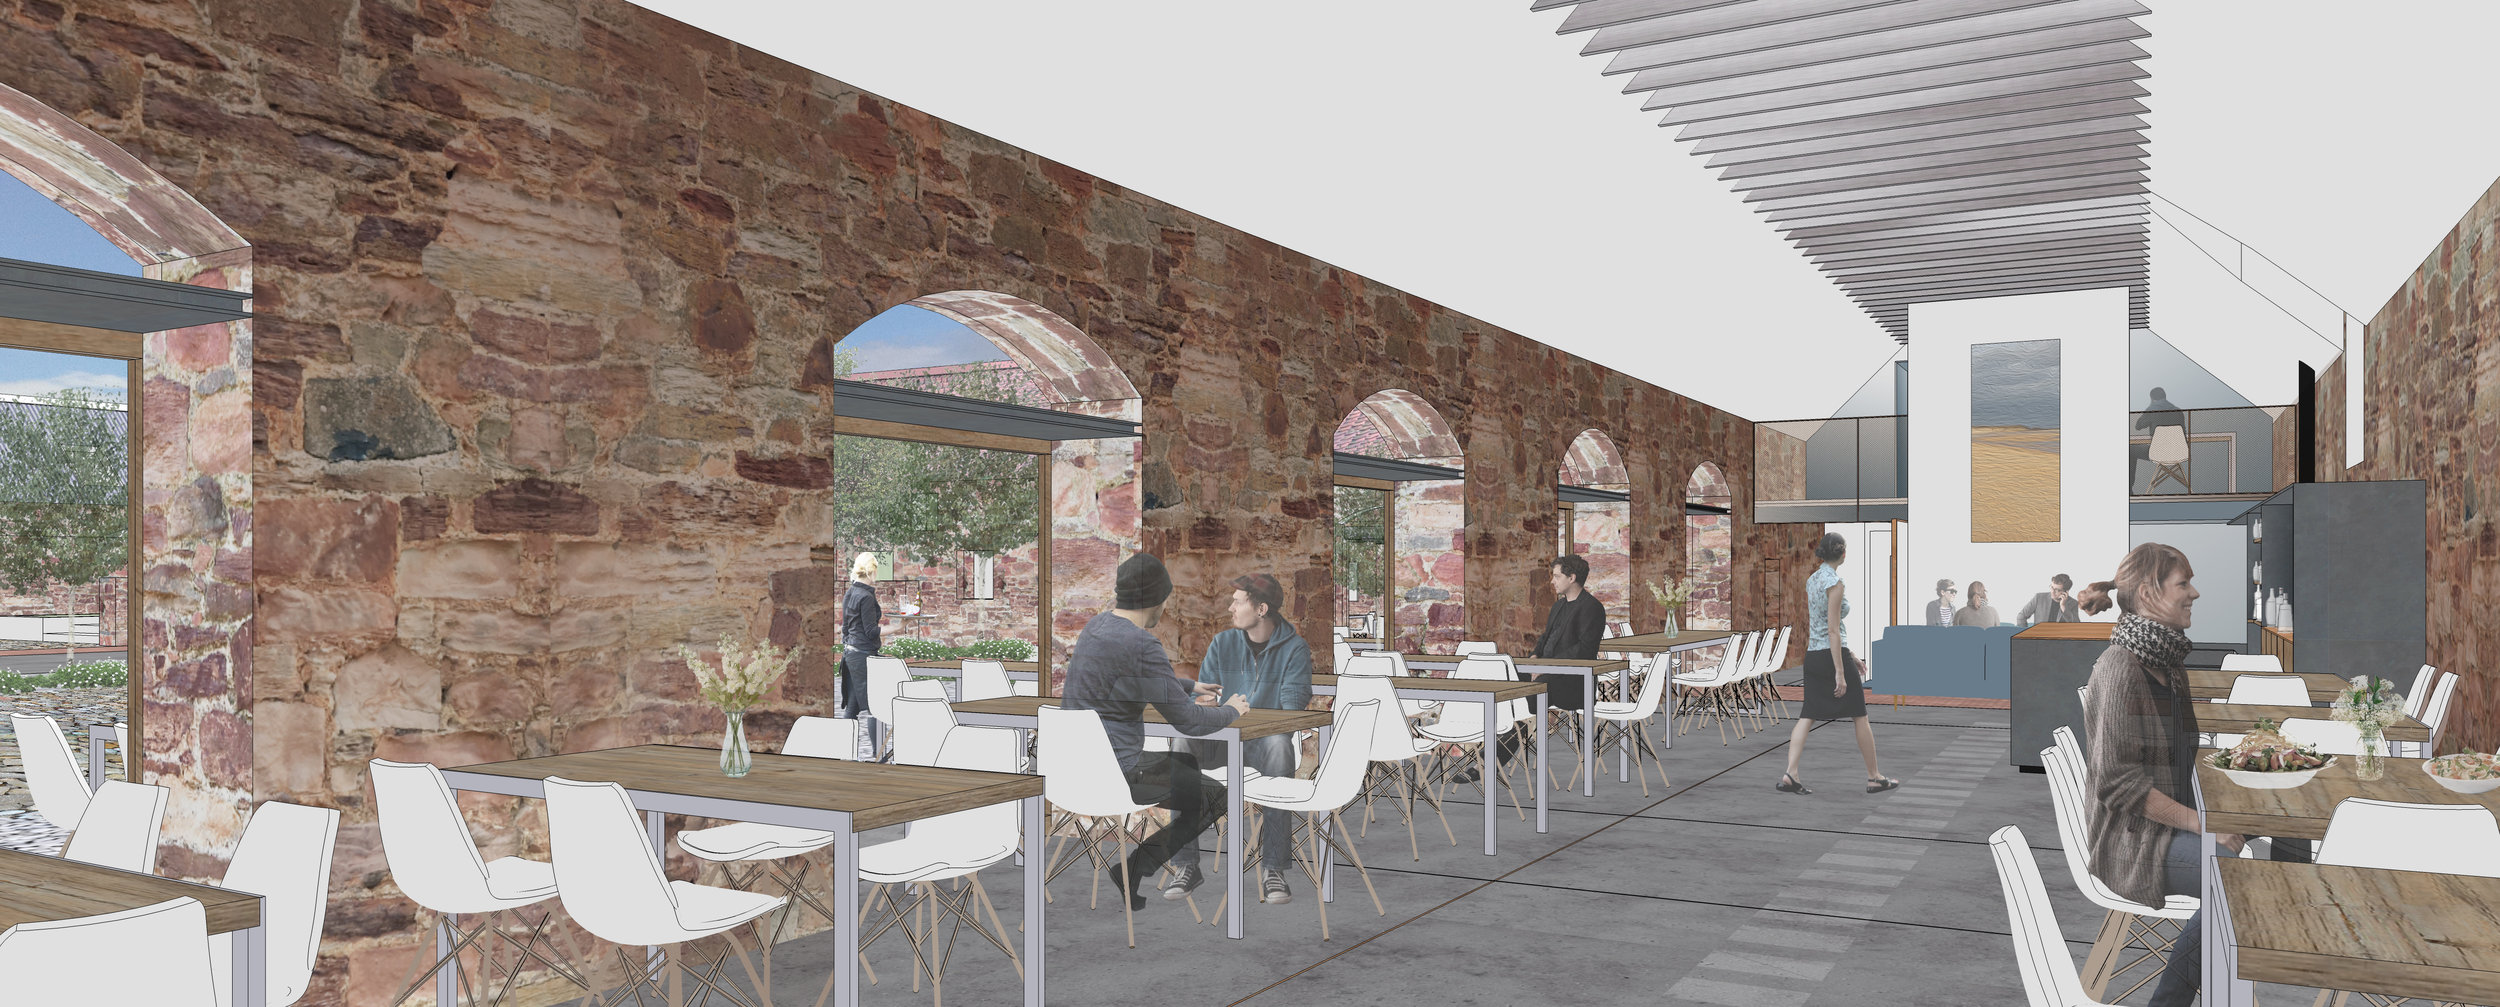 163 170510 CRM View of Restaurant.jpg